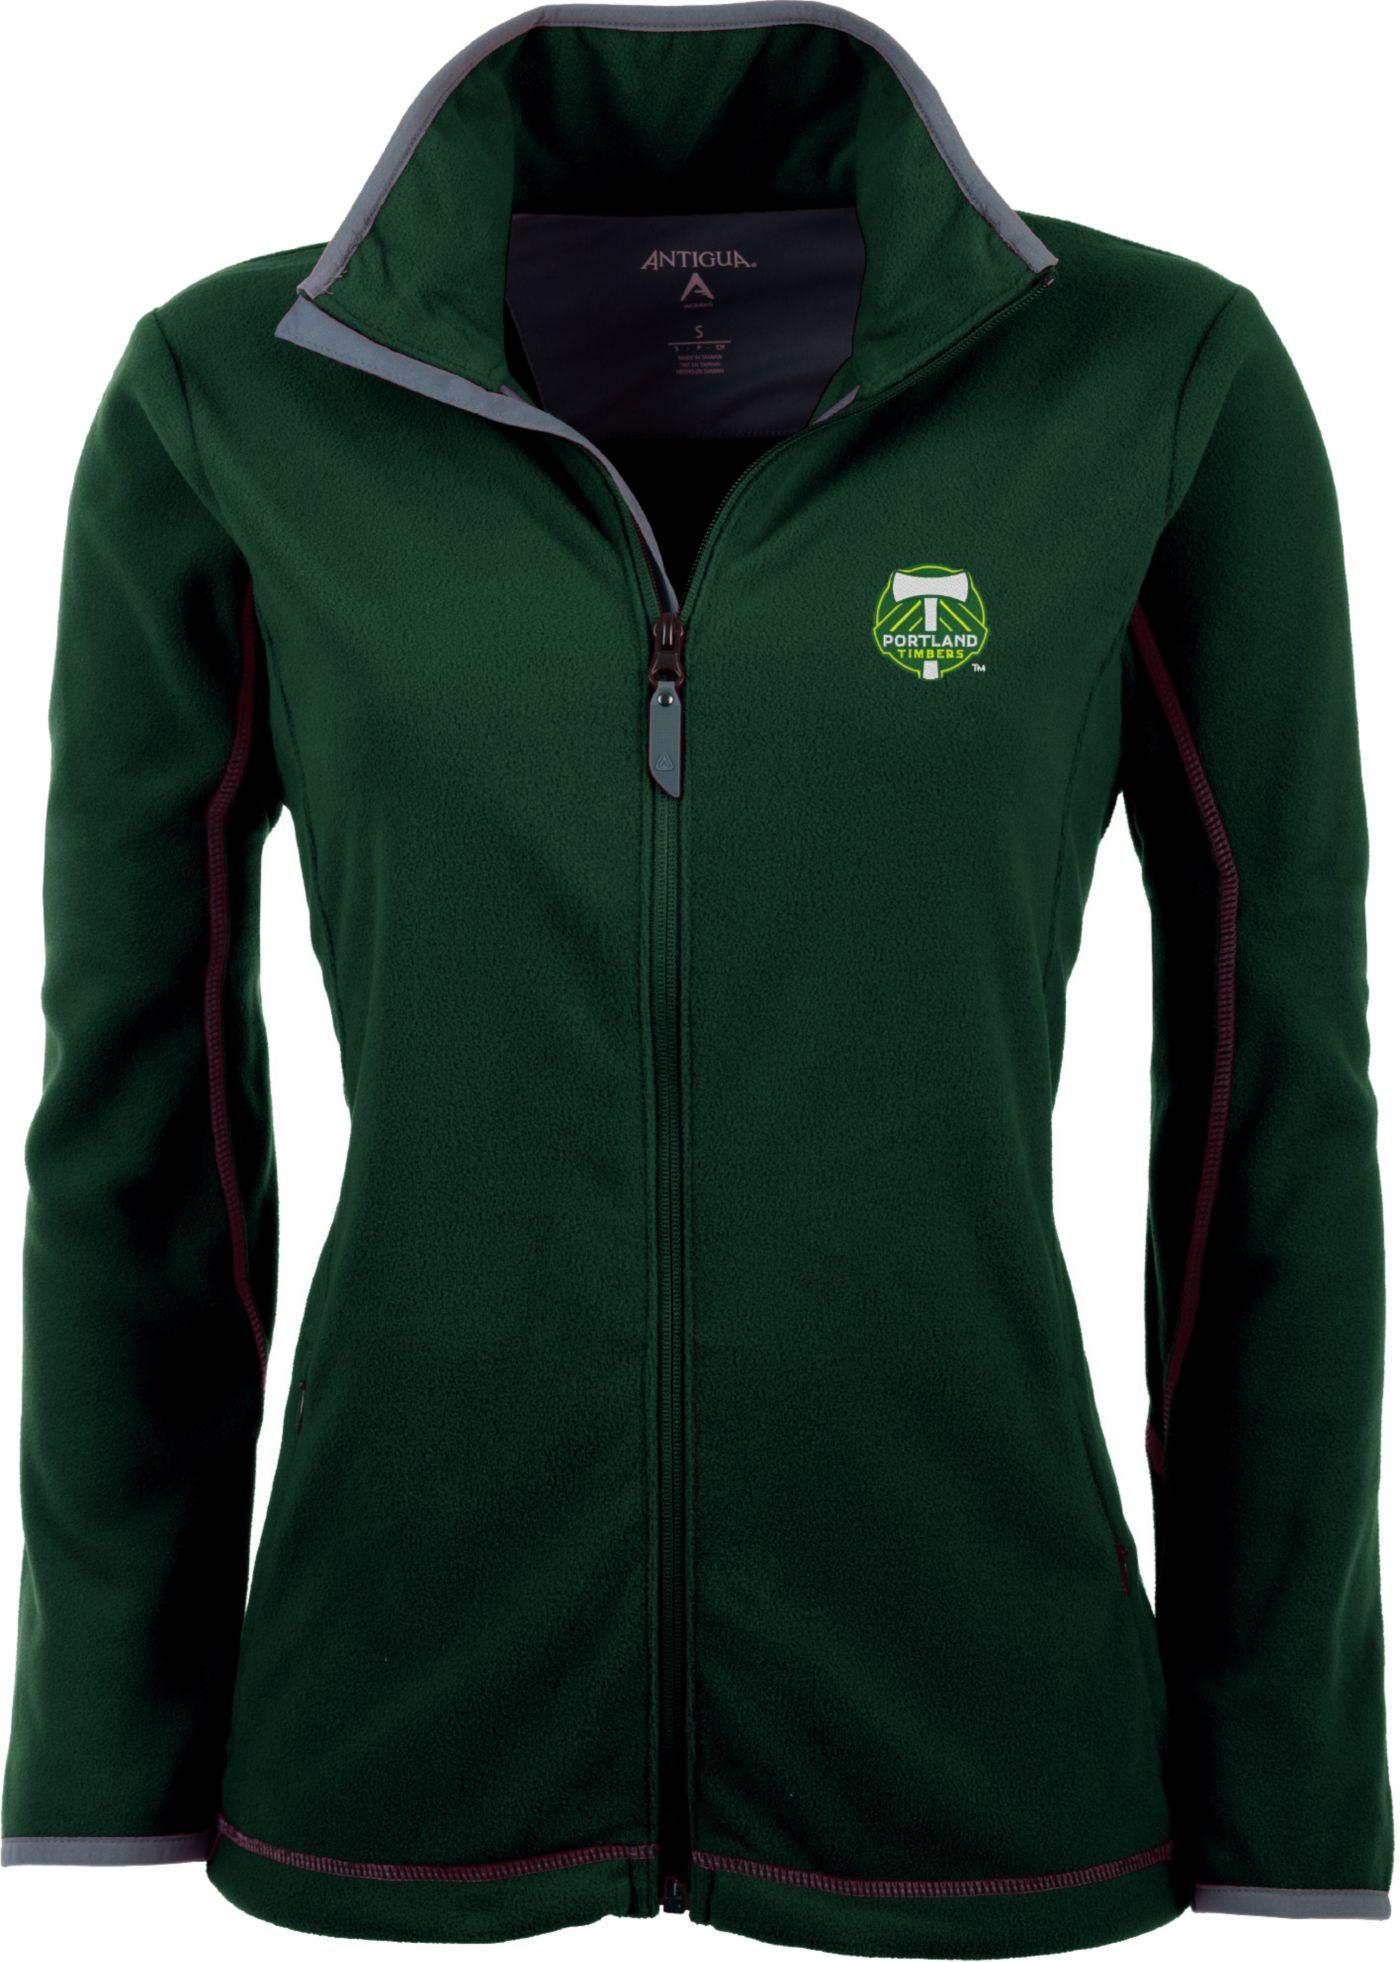 Antigua Women's Portland Timbers Hunter Green Ice Full-Zip Fleece Jacket